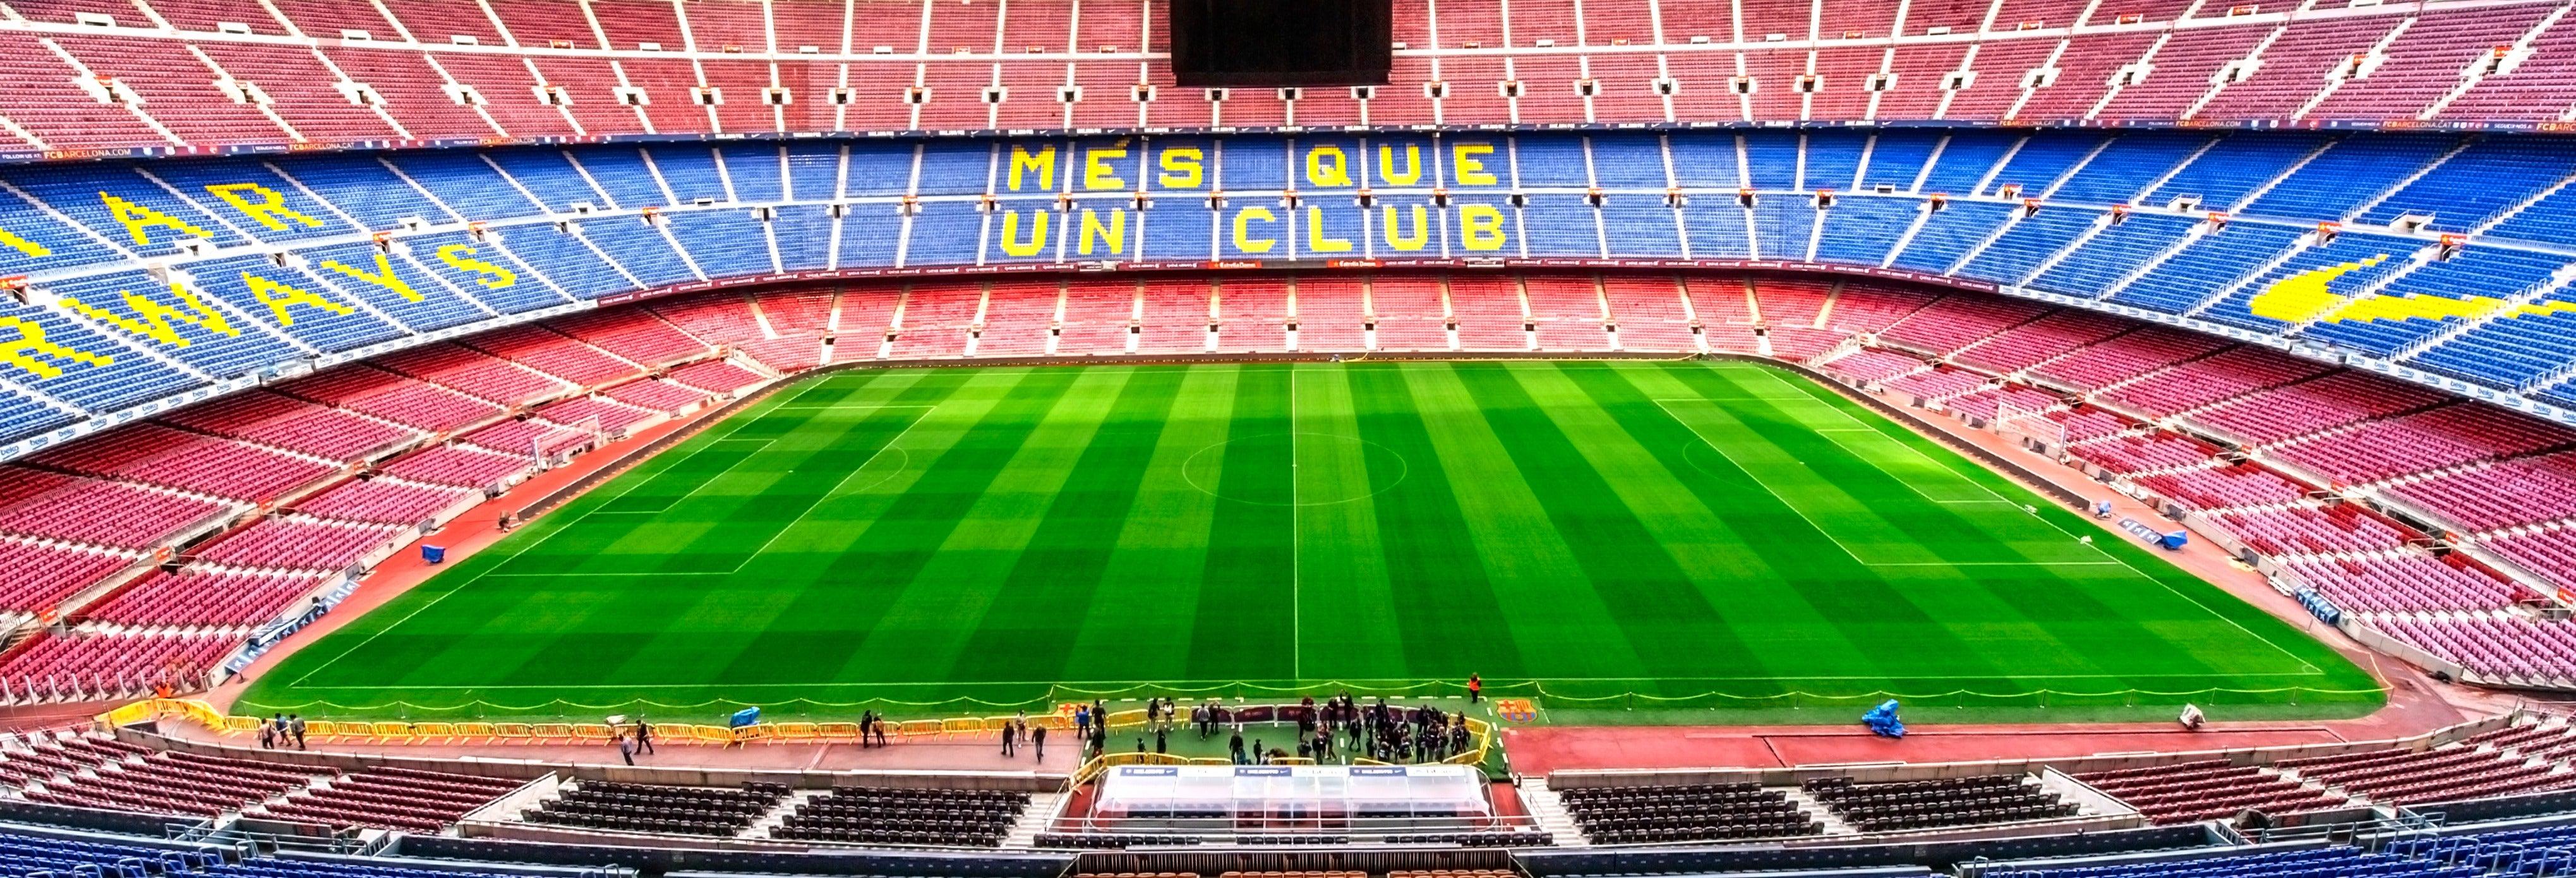 Visita guidata del Camp Nou